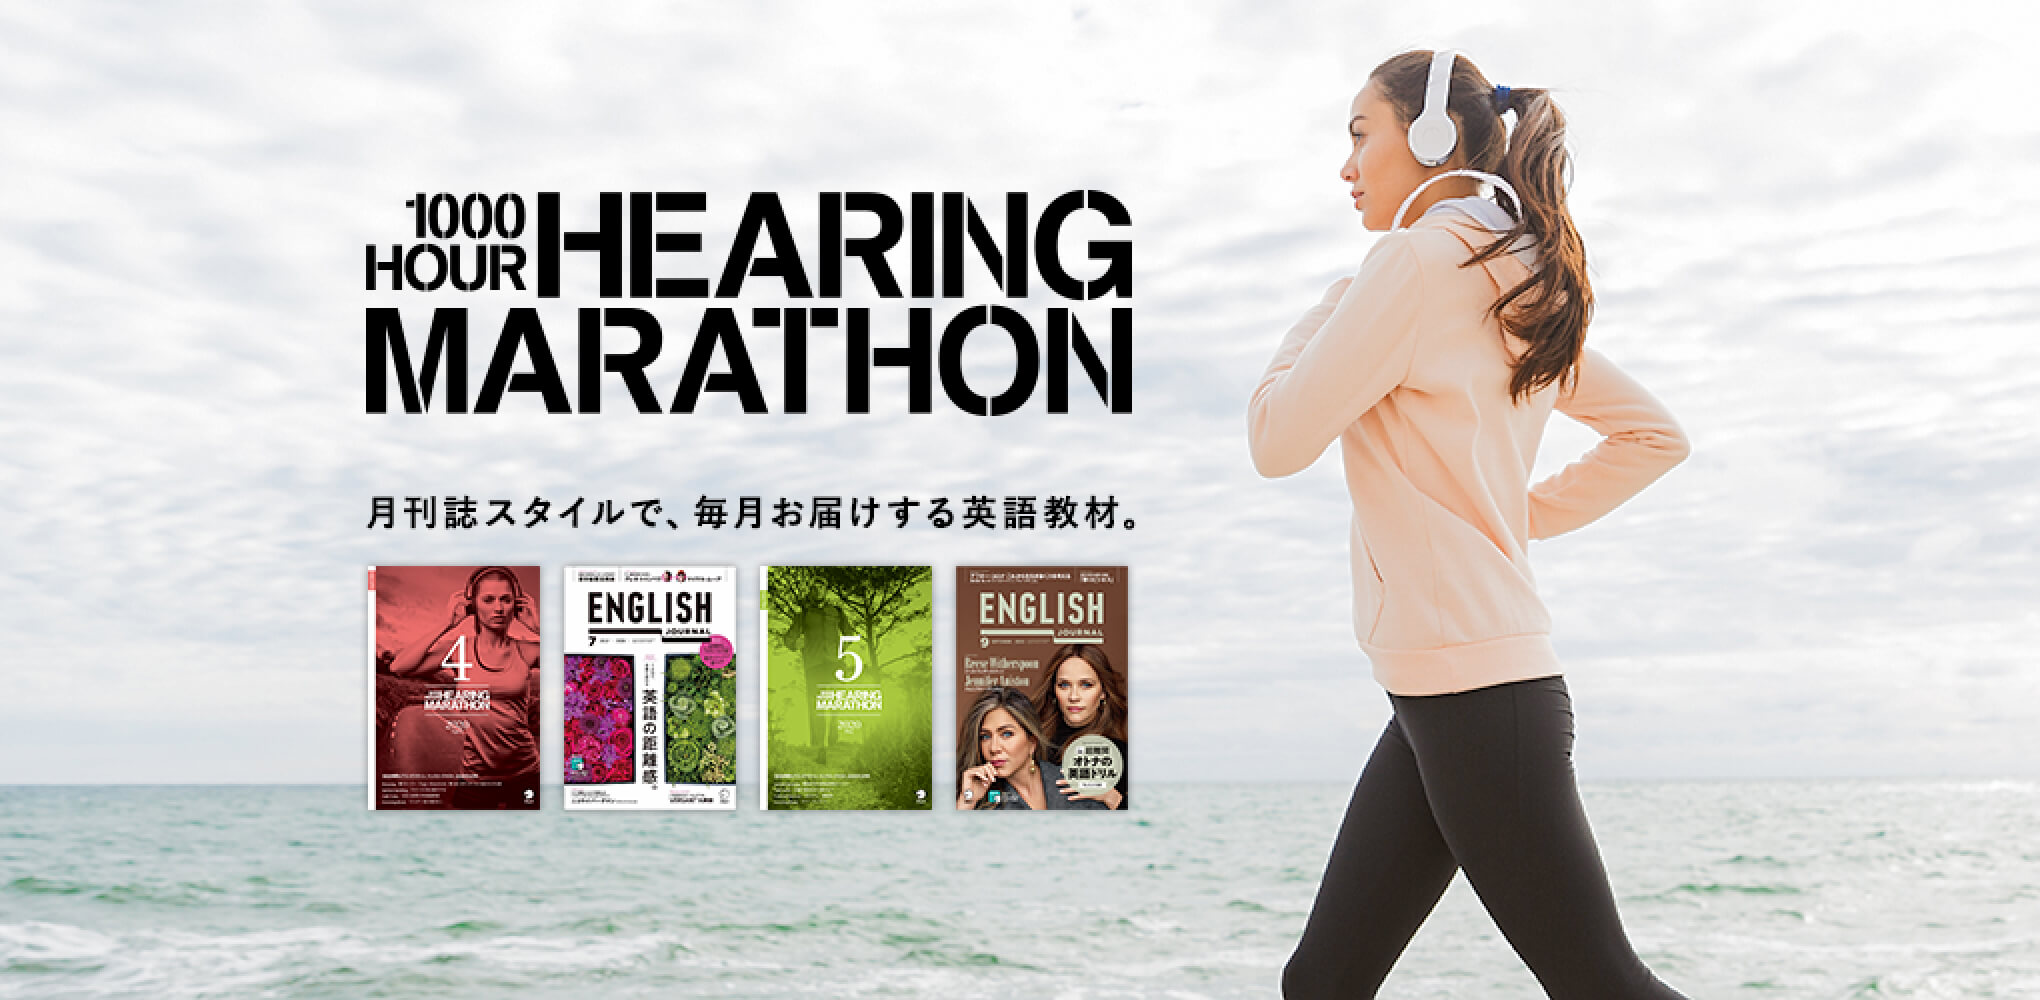 HEARING MARATHON